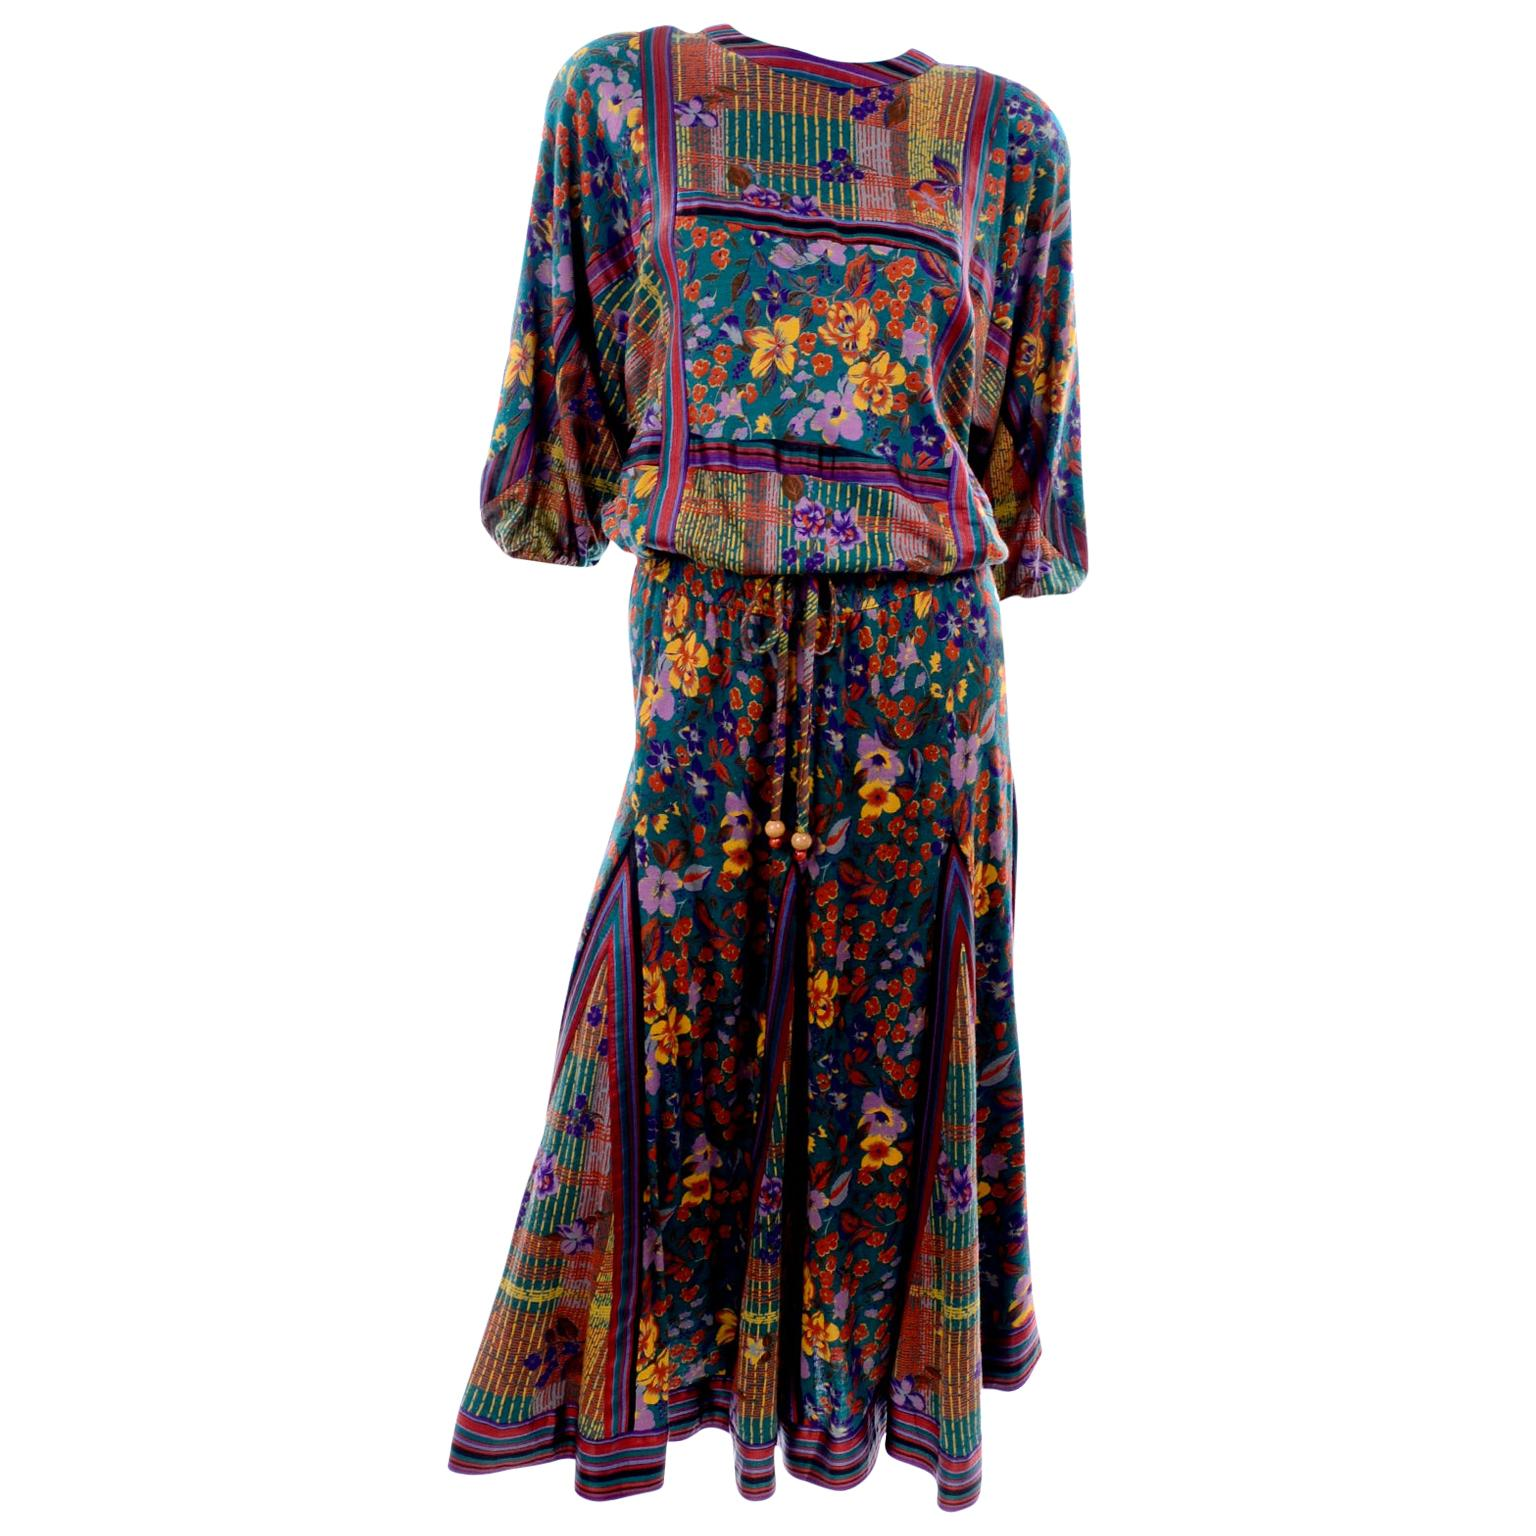 Diane Freis Vintage 2 Pc Dress W Drawstring Top & Gored Skirt in Floral Print